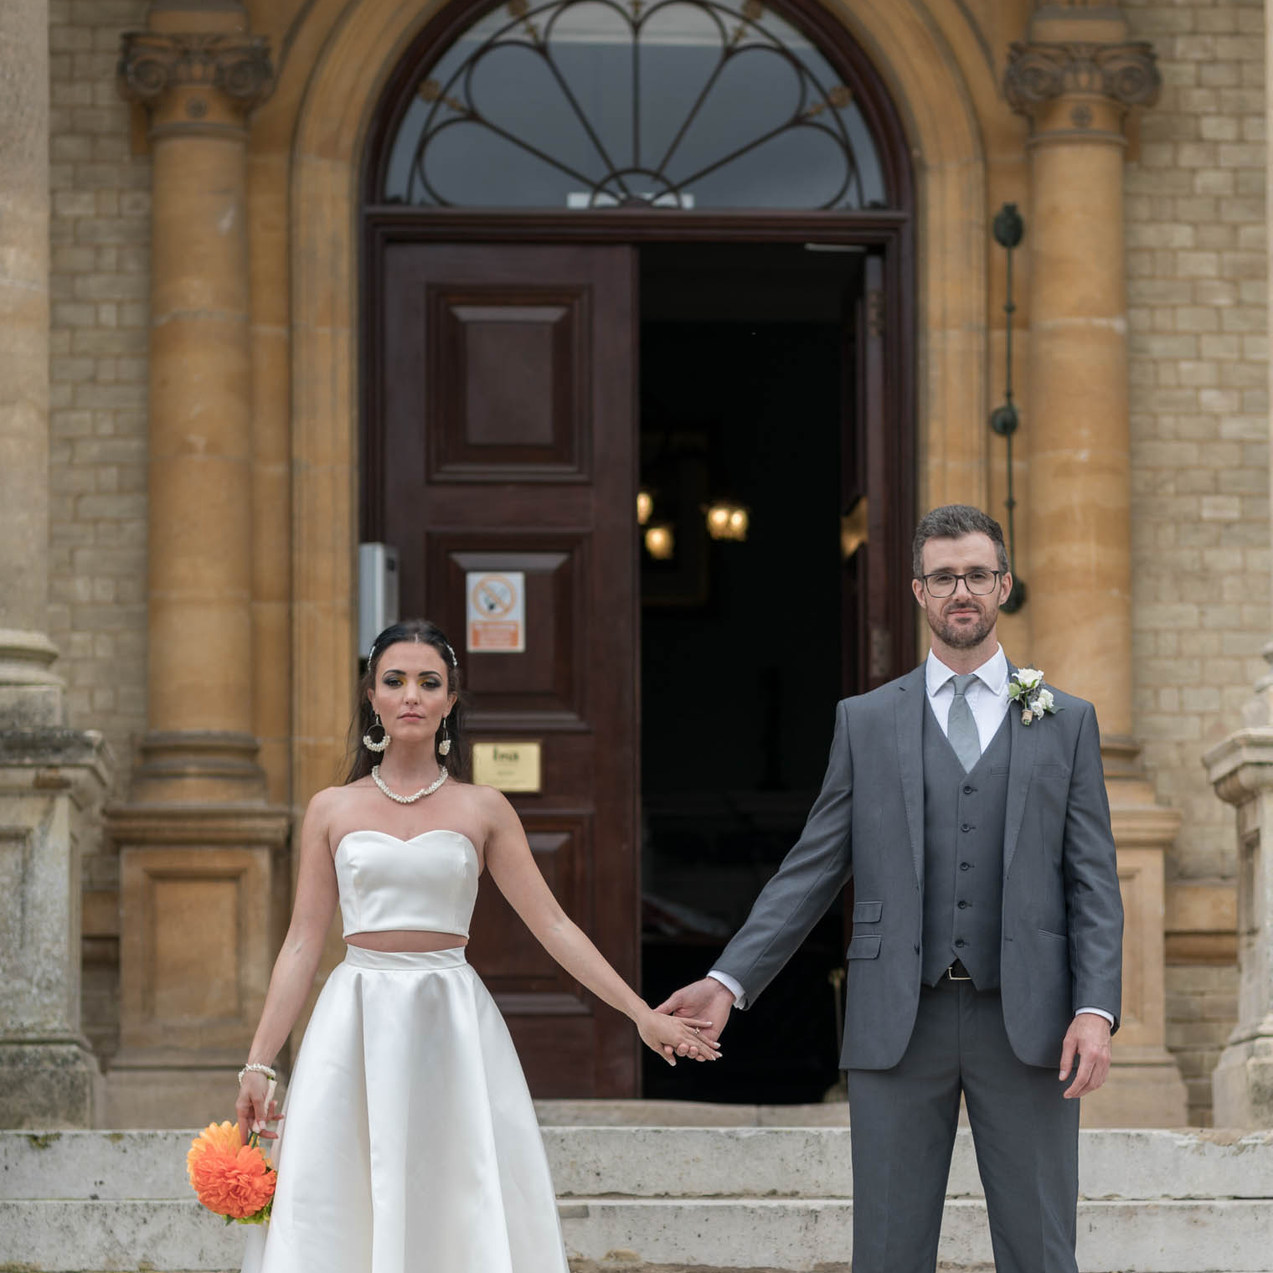 fStop wedding photography-41.jpg